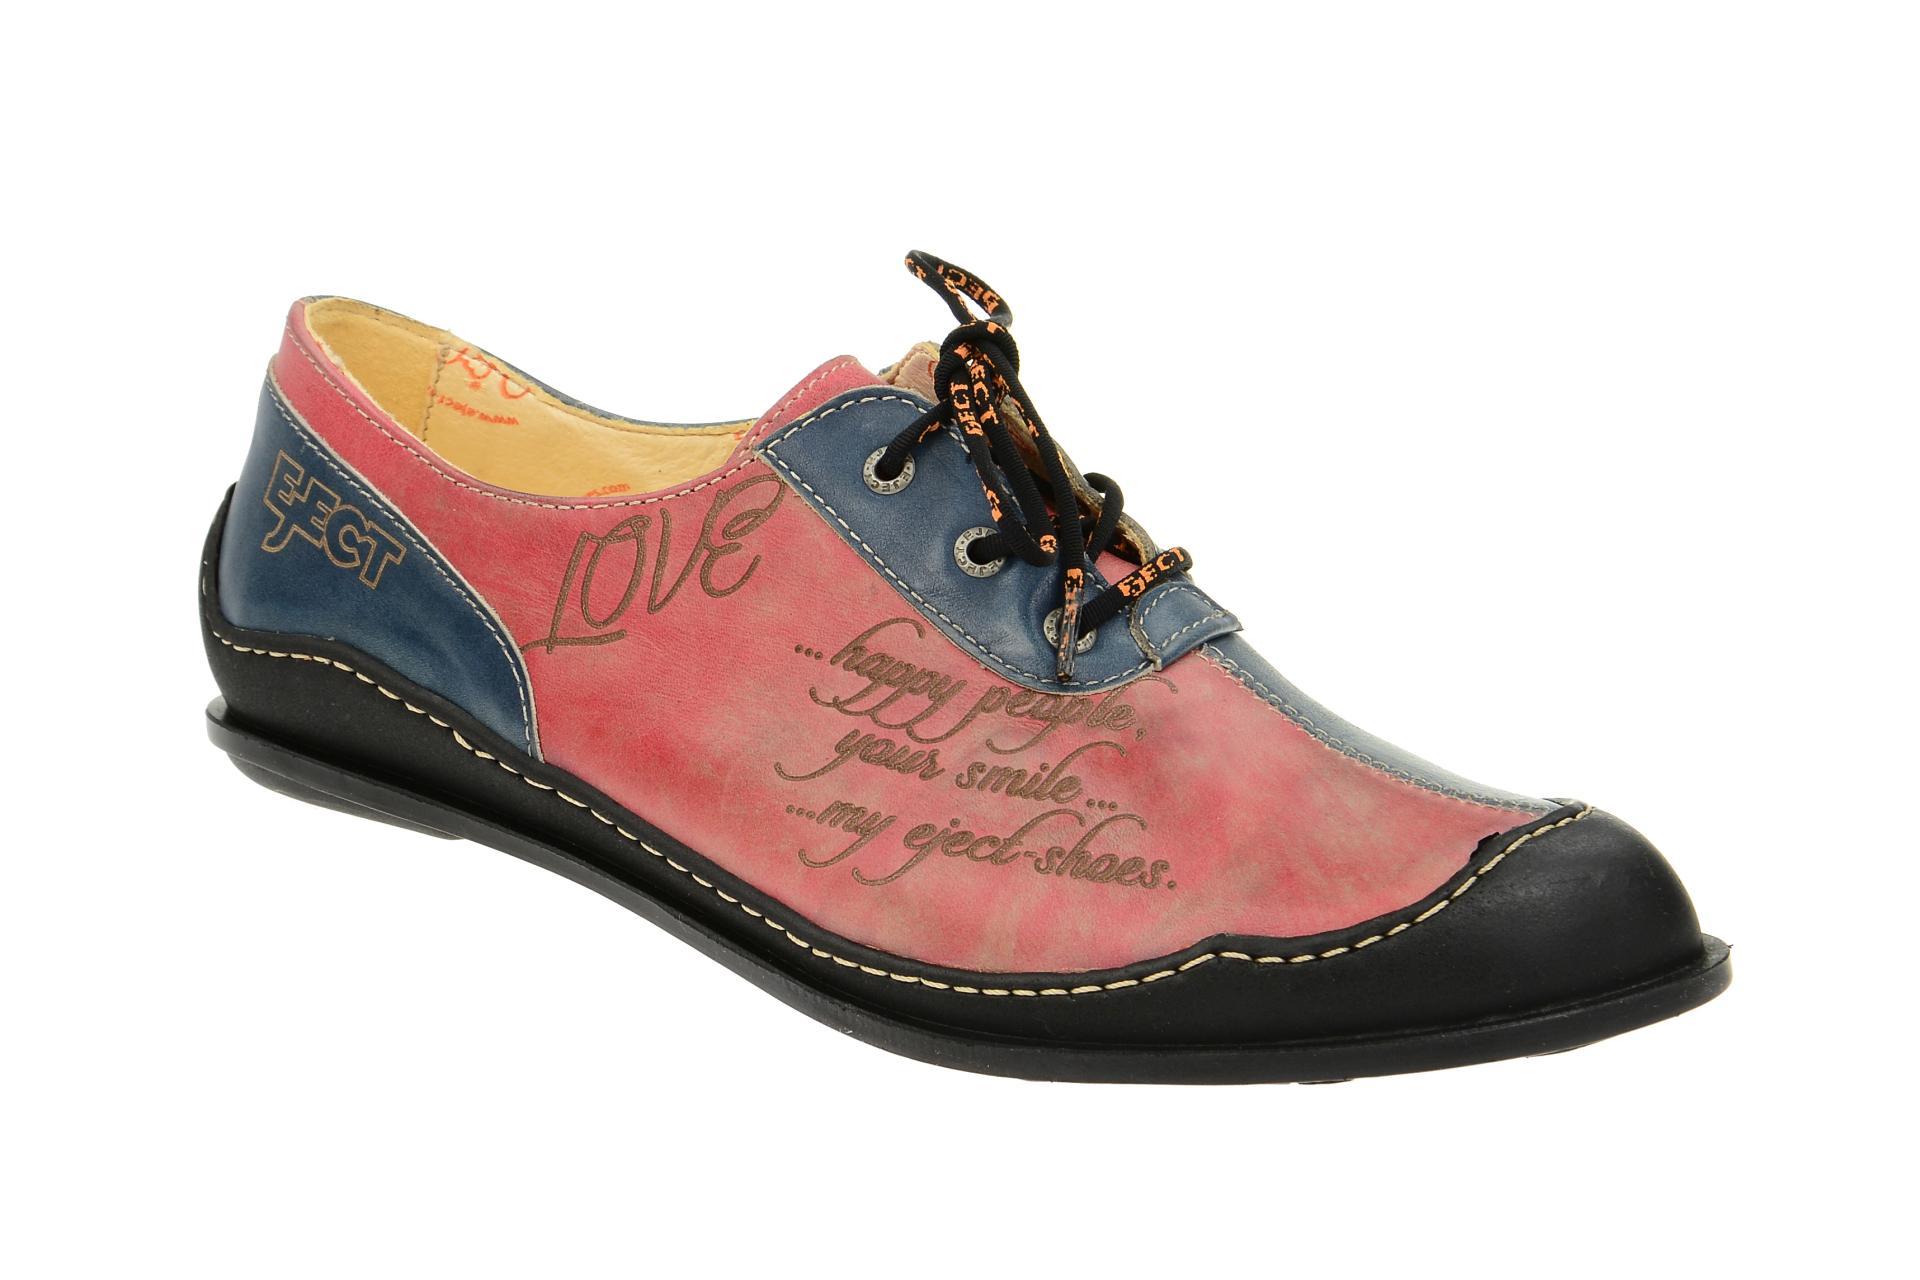 Schuhe eject kaufen